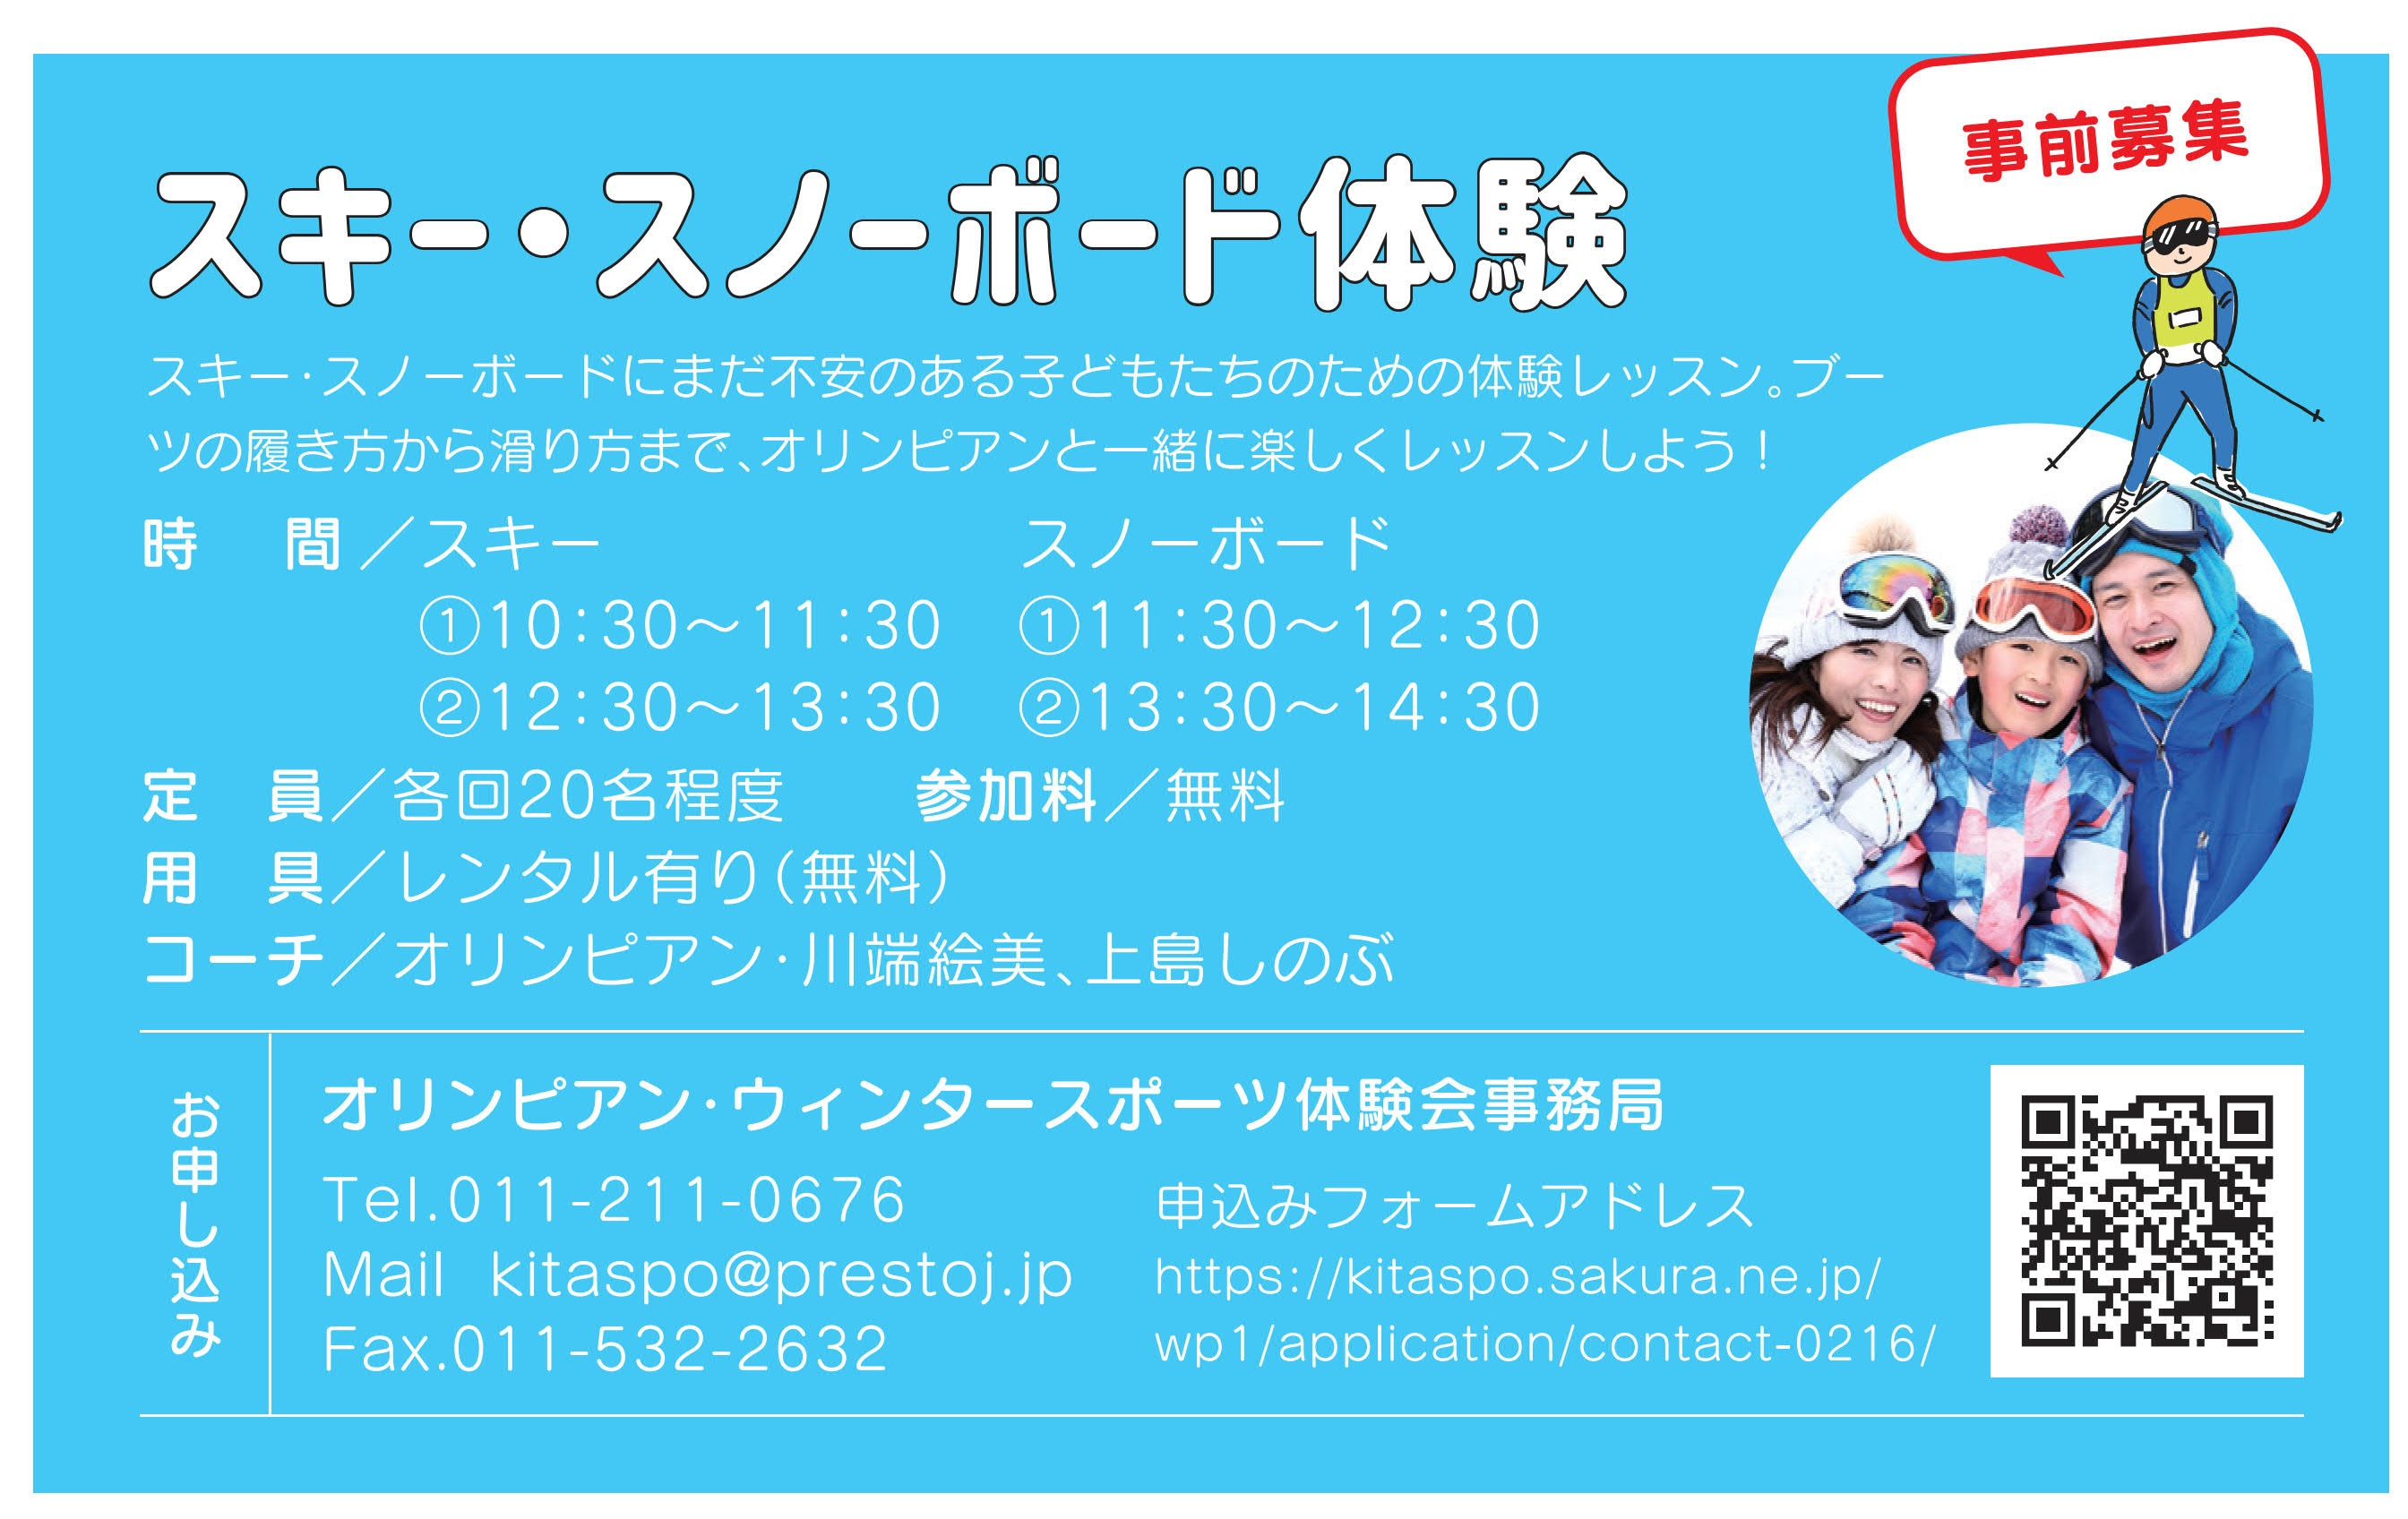 snowsports event2020-5.jpg